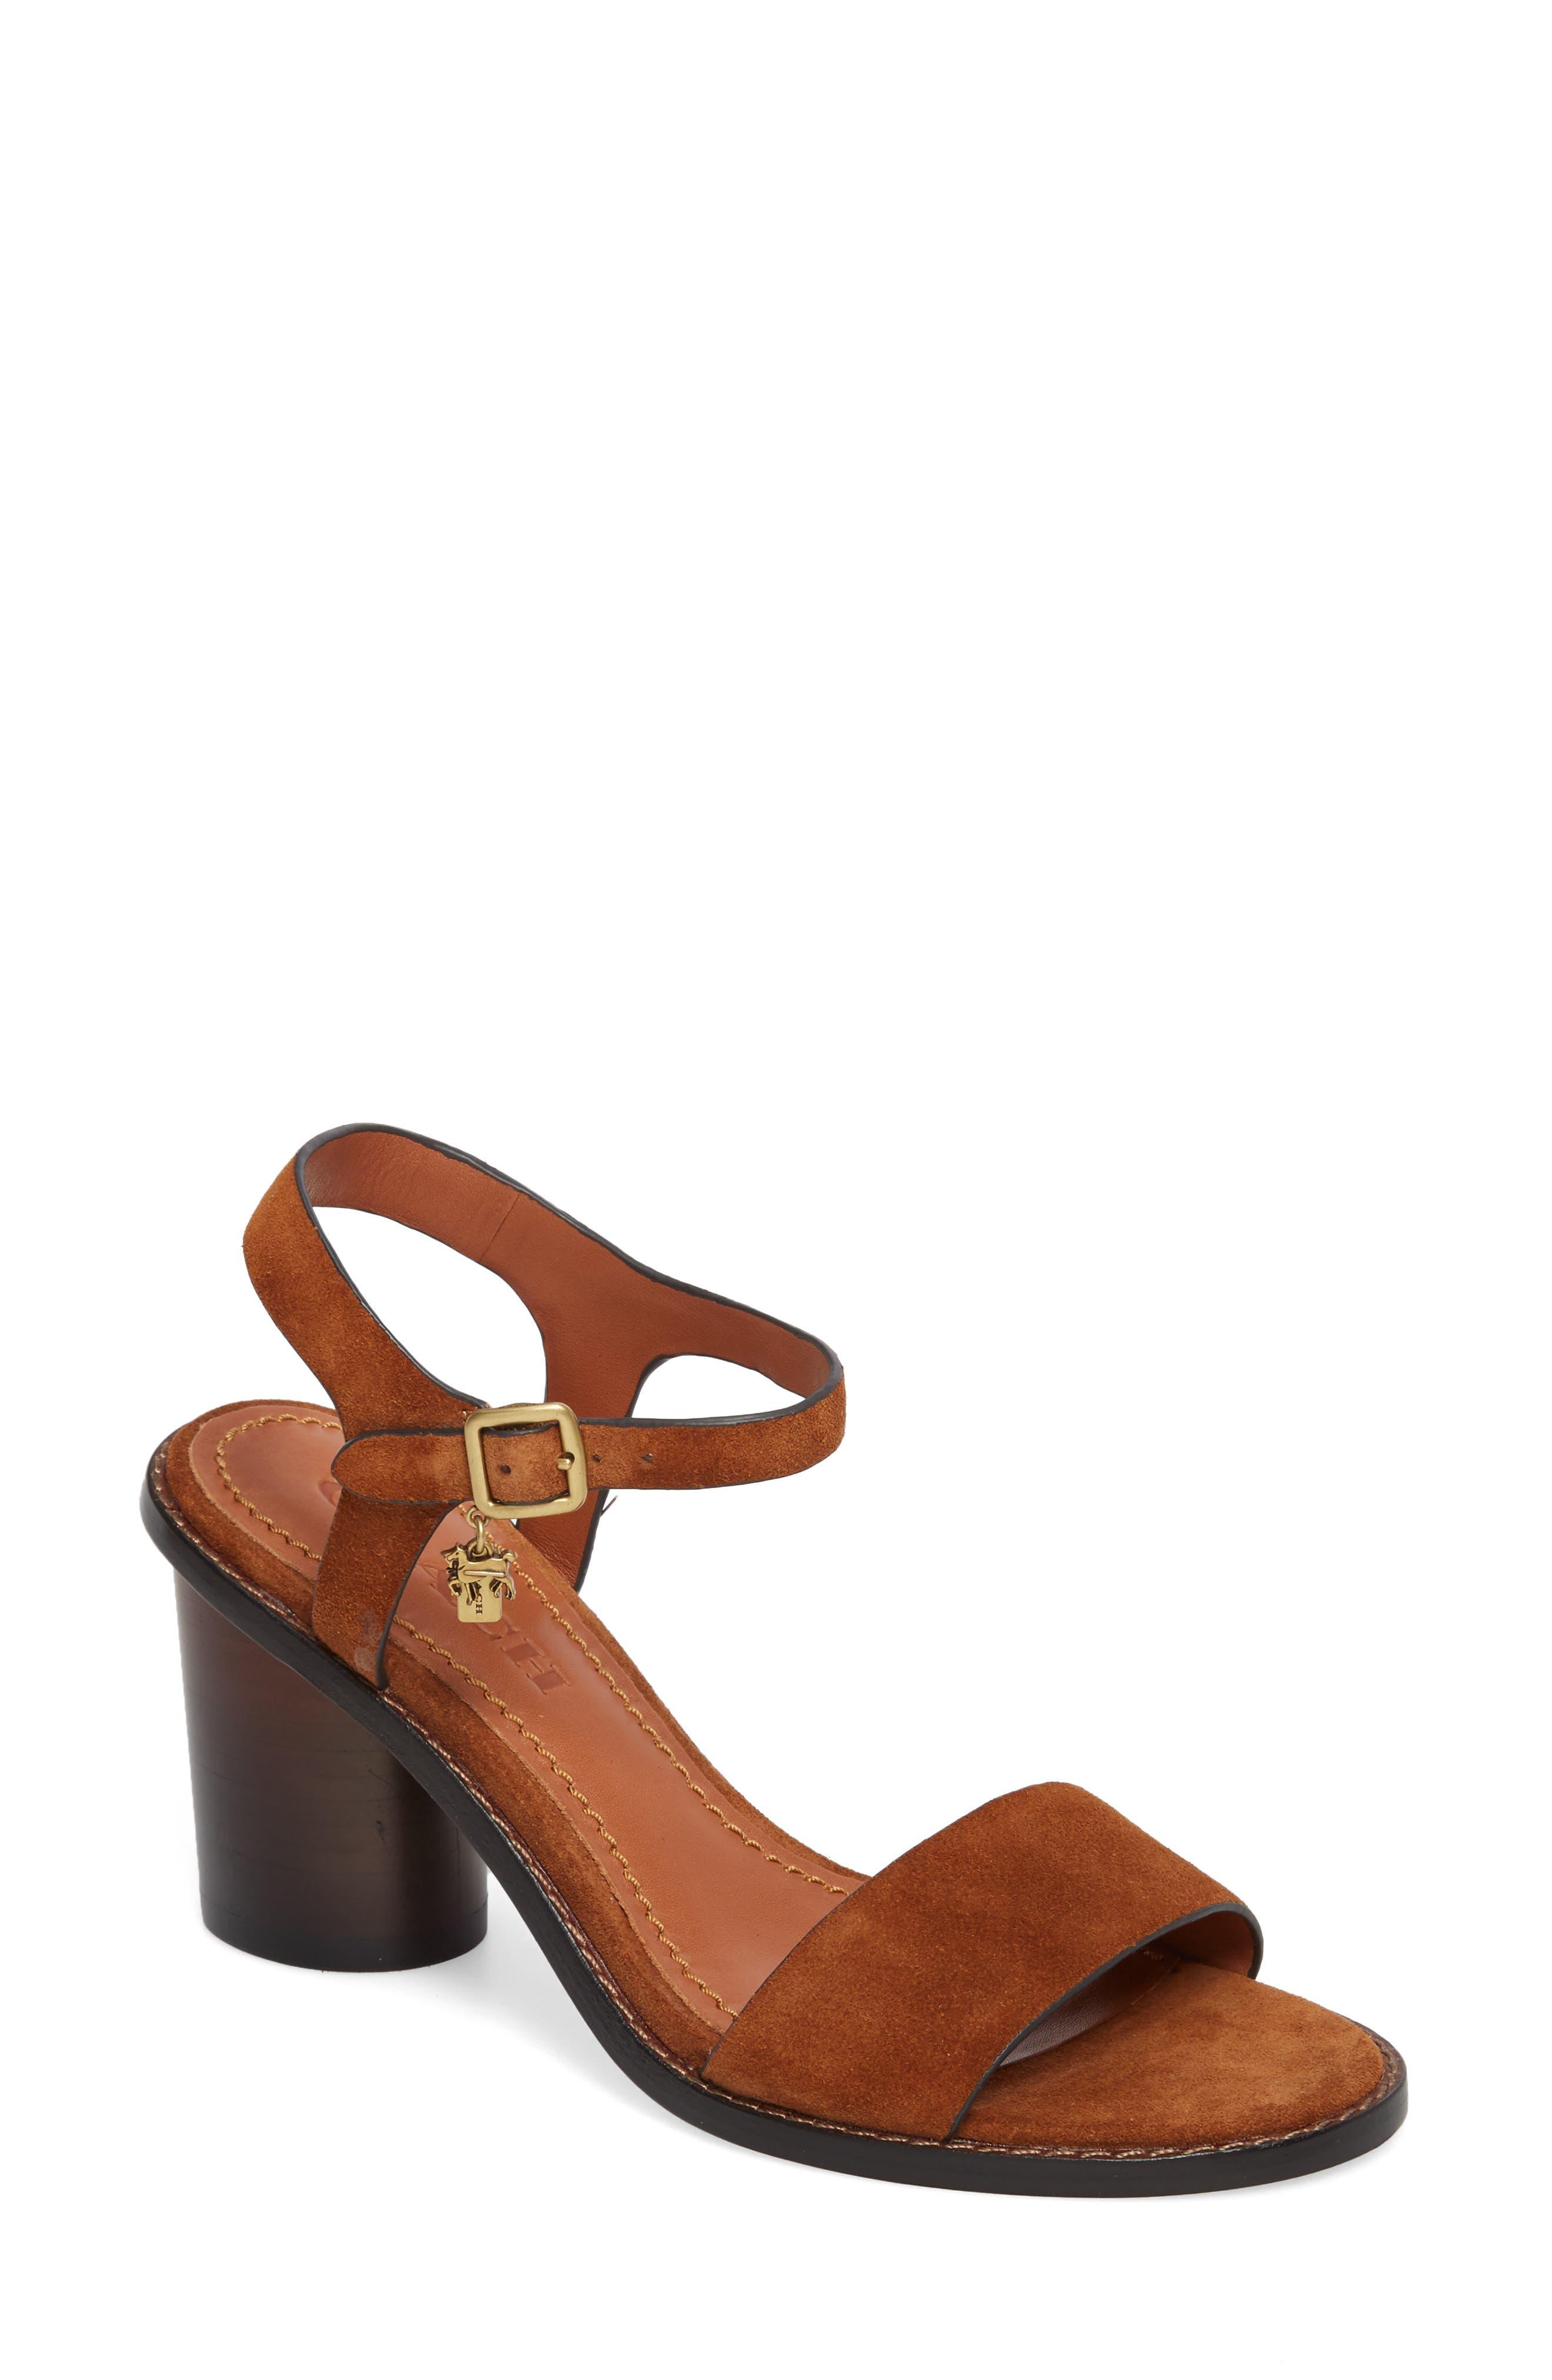 Column Heel Sandal,                         Main,                         color, Saddle Suede